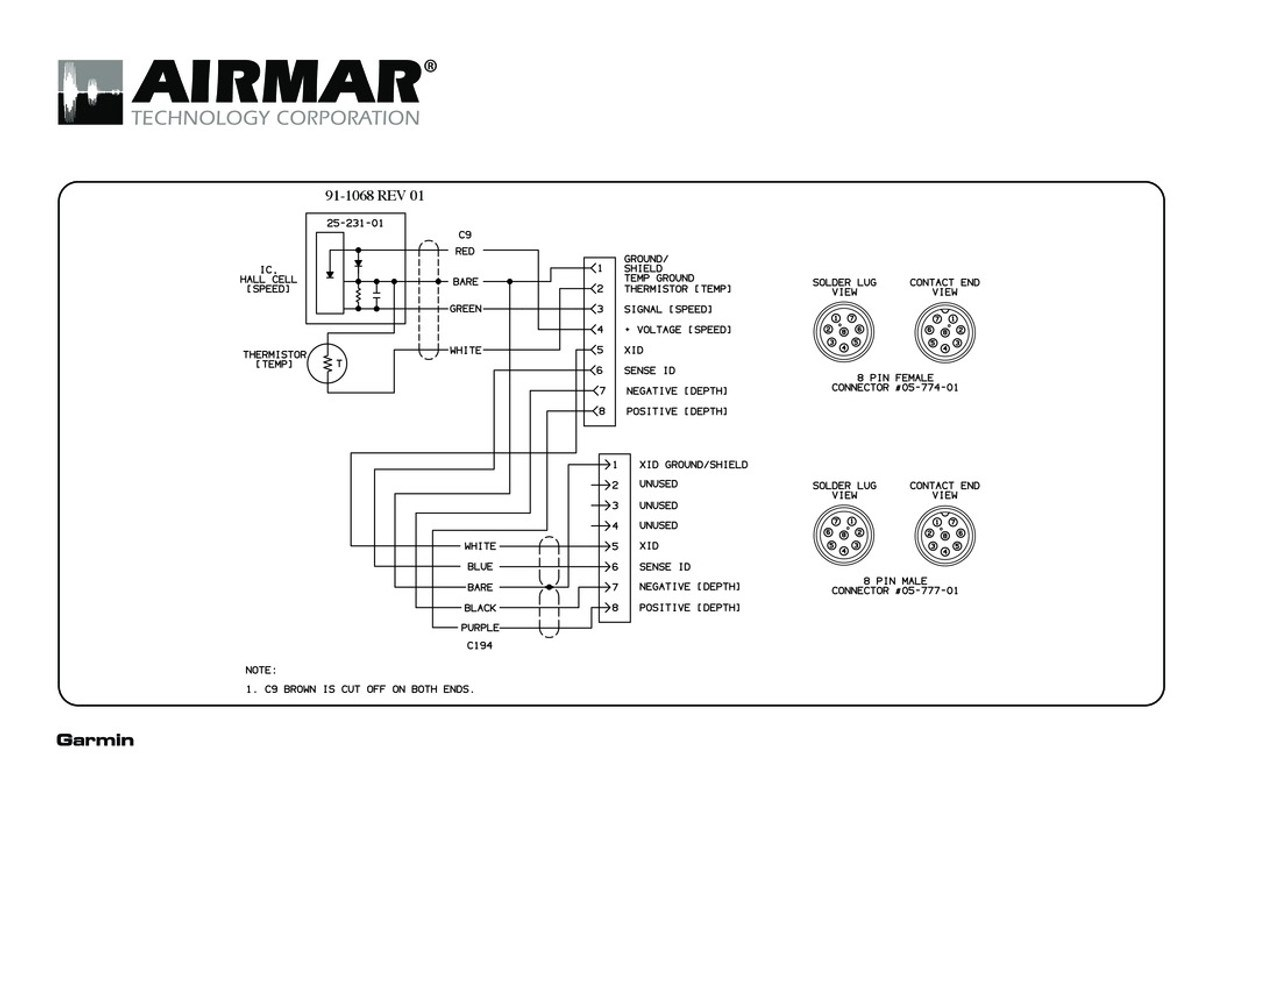 medium resolution of airmar wiring diagram garmin st850 8 pin s t blue bottle marine mirror